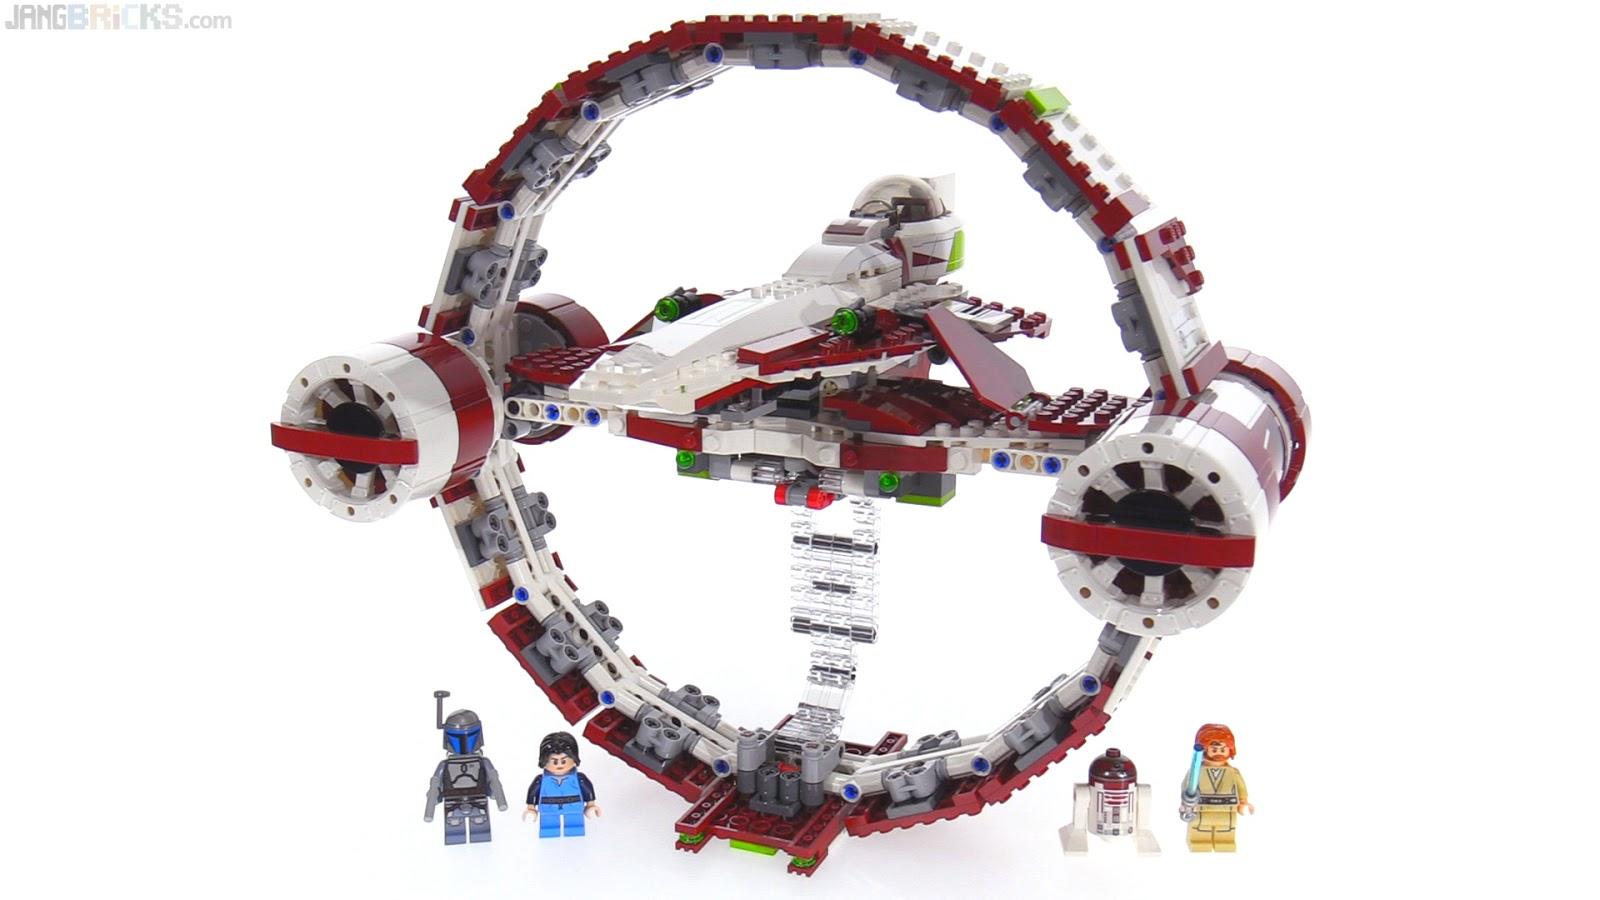 Lego Spiderman Malvorlagen Star Wars 1 Lego Spiderman: JANGBRiCKS LEGO Reviews & MOCs